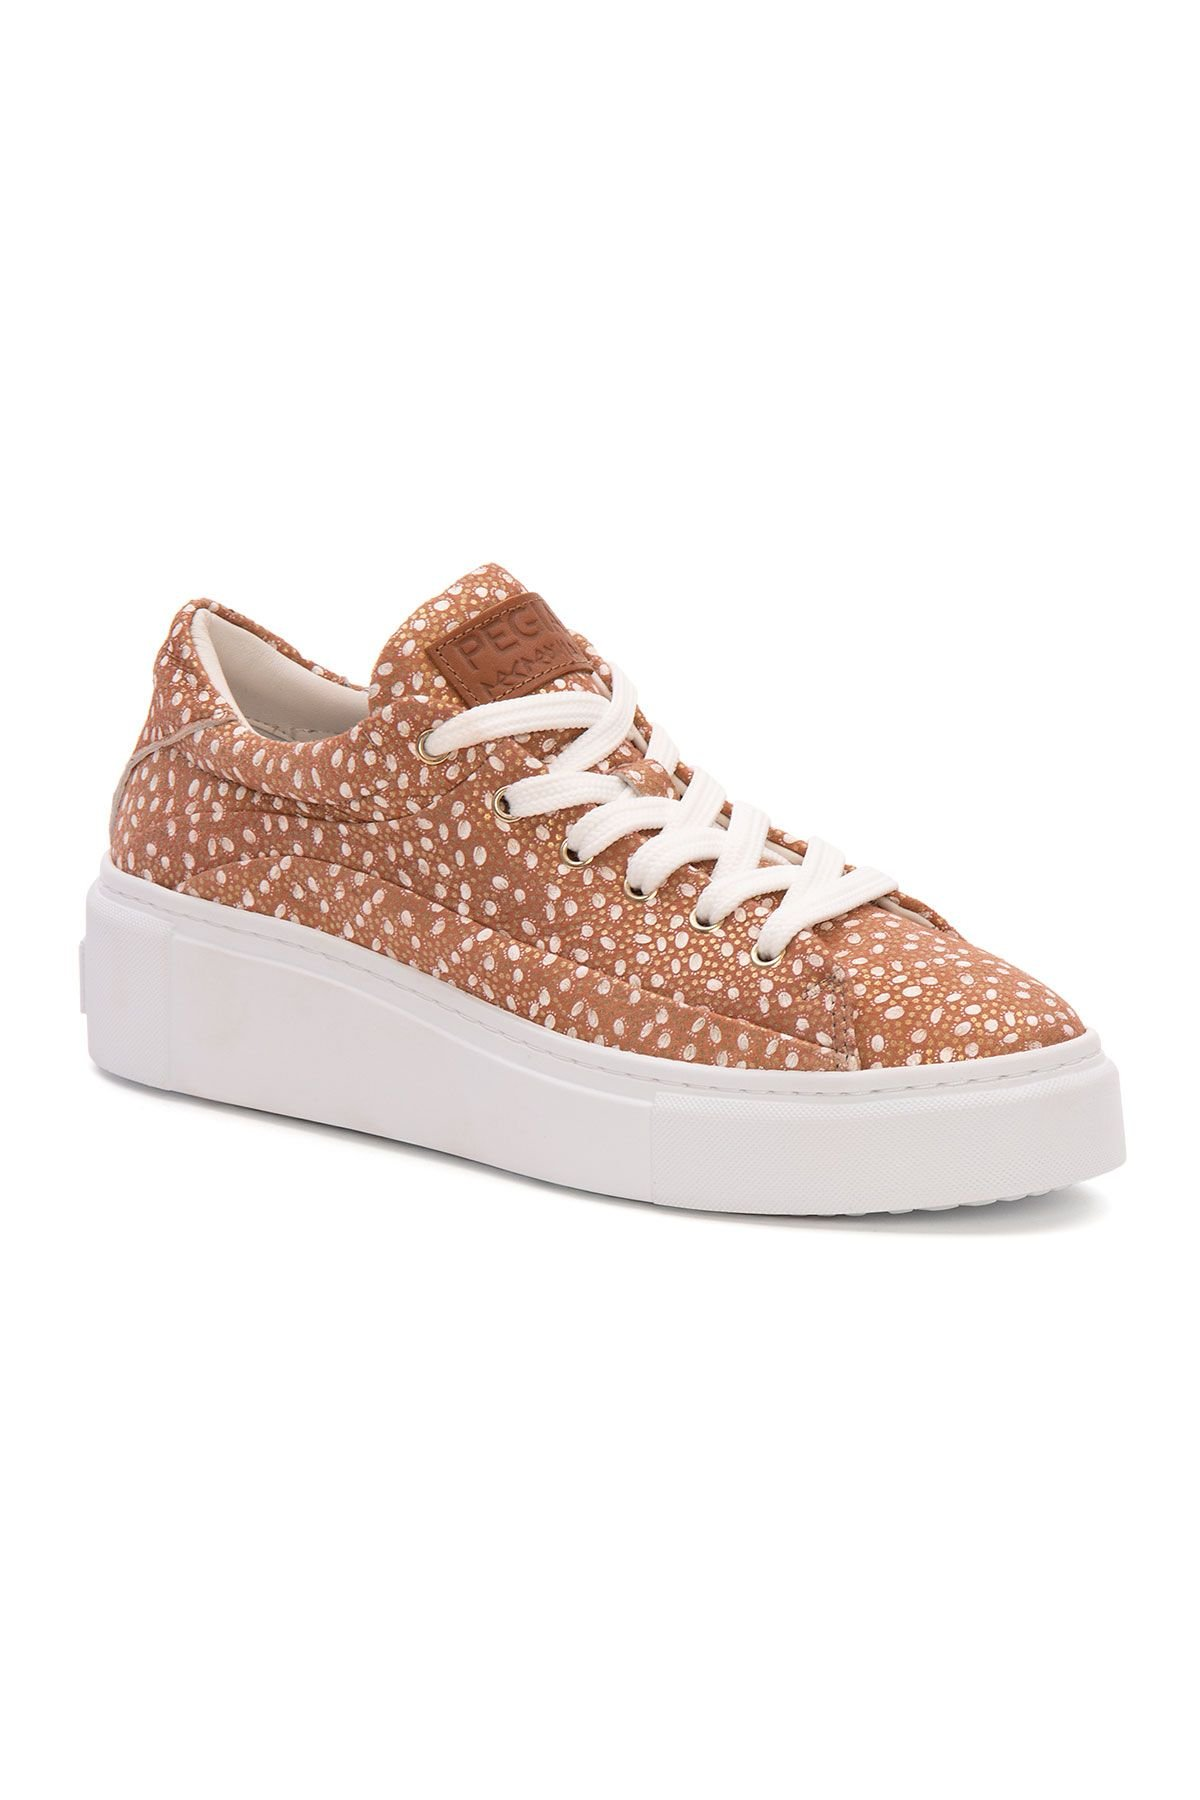 Pegia Genuine Leather Women's Sneaker LA1636 Powdery